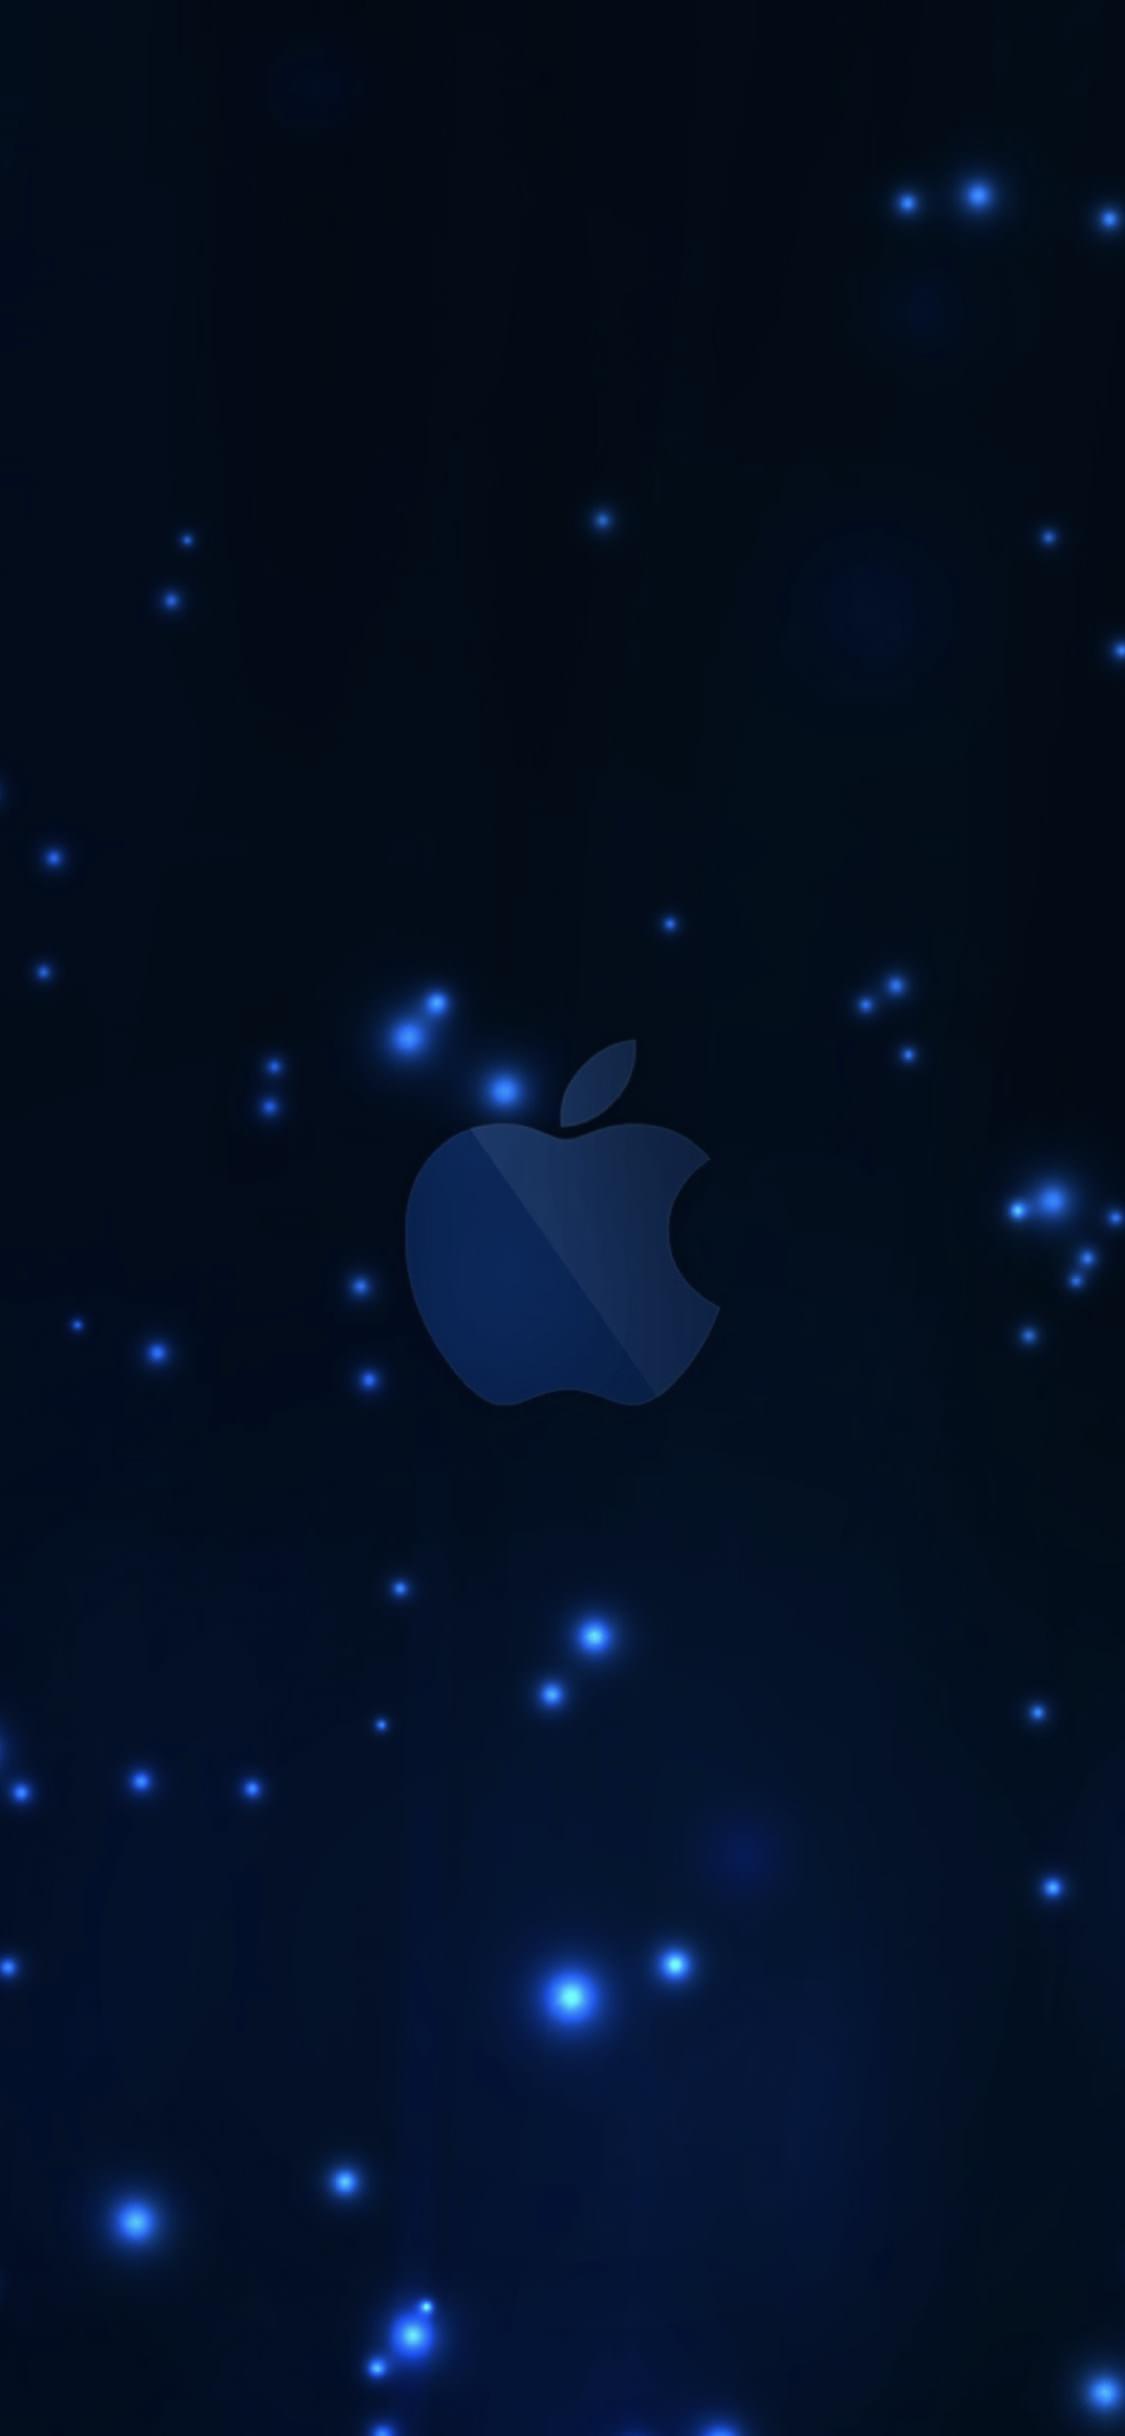 iPhone XS , iPhone X 壁紙 0610